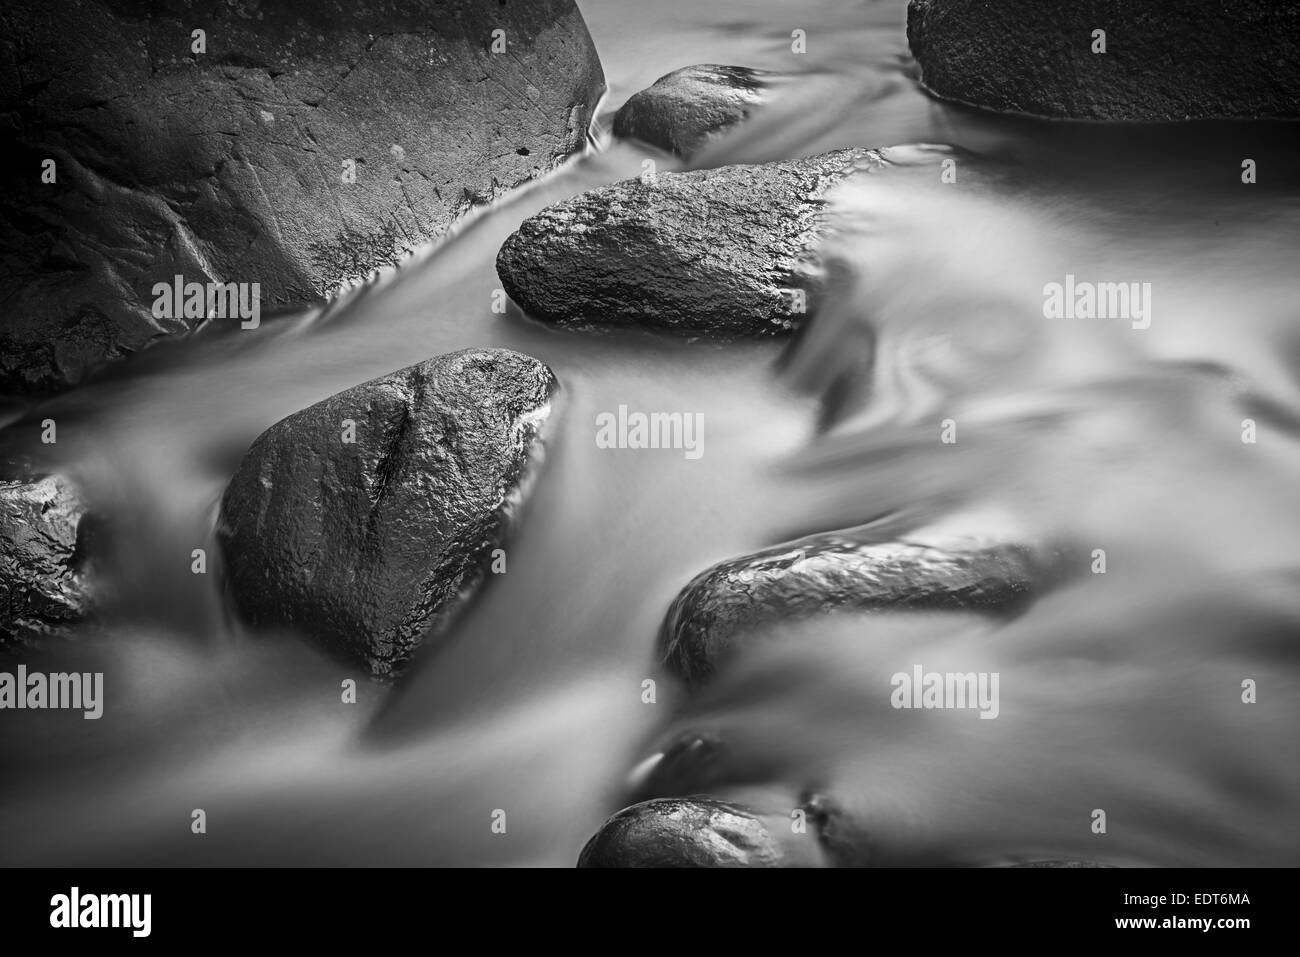 Flowing Water & Rocks In Stream Black & White - Stock Image